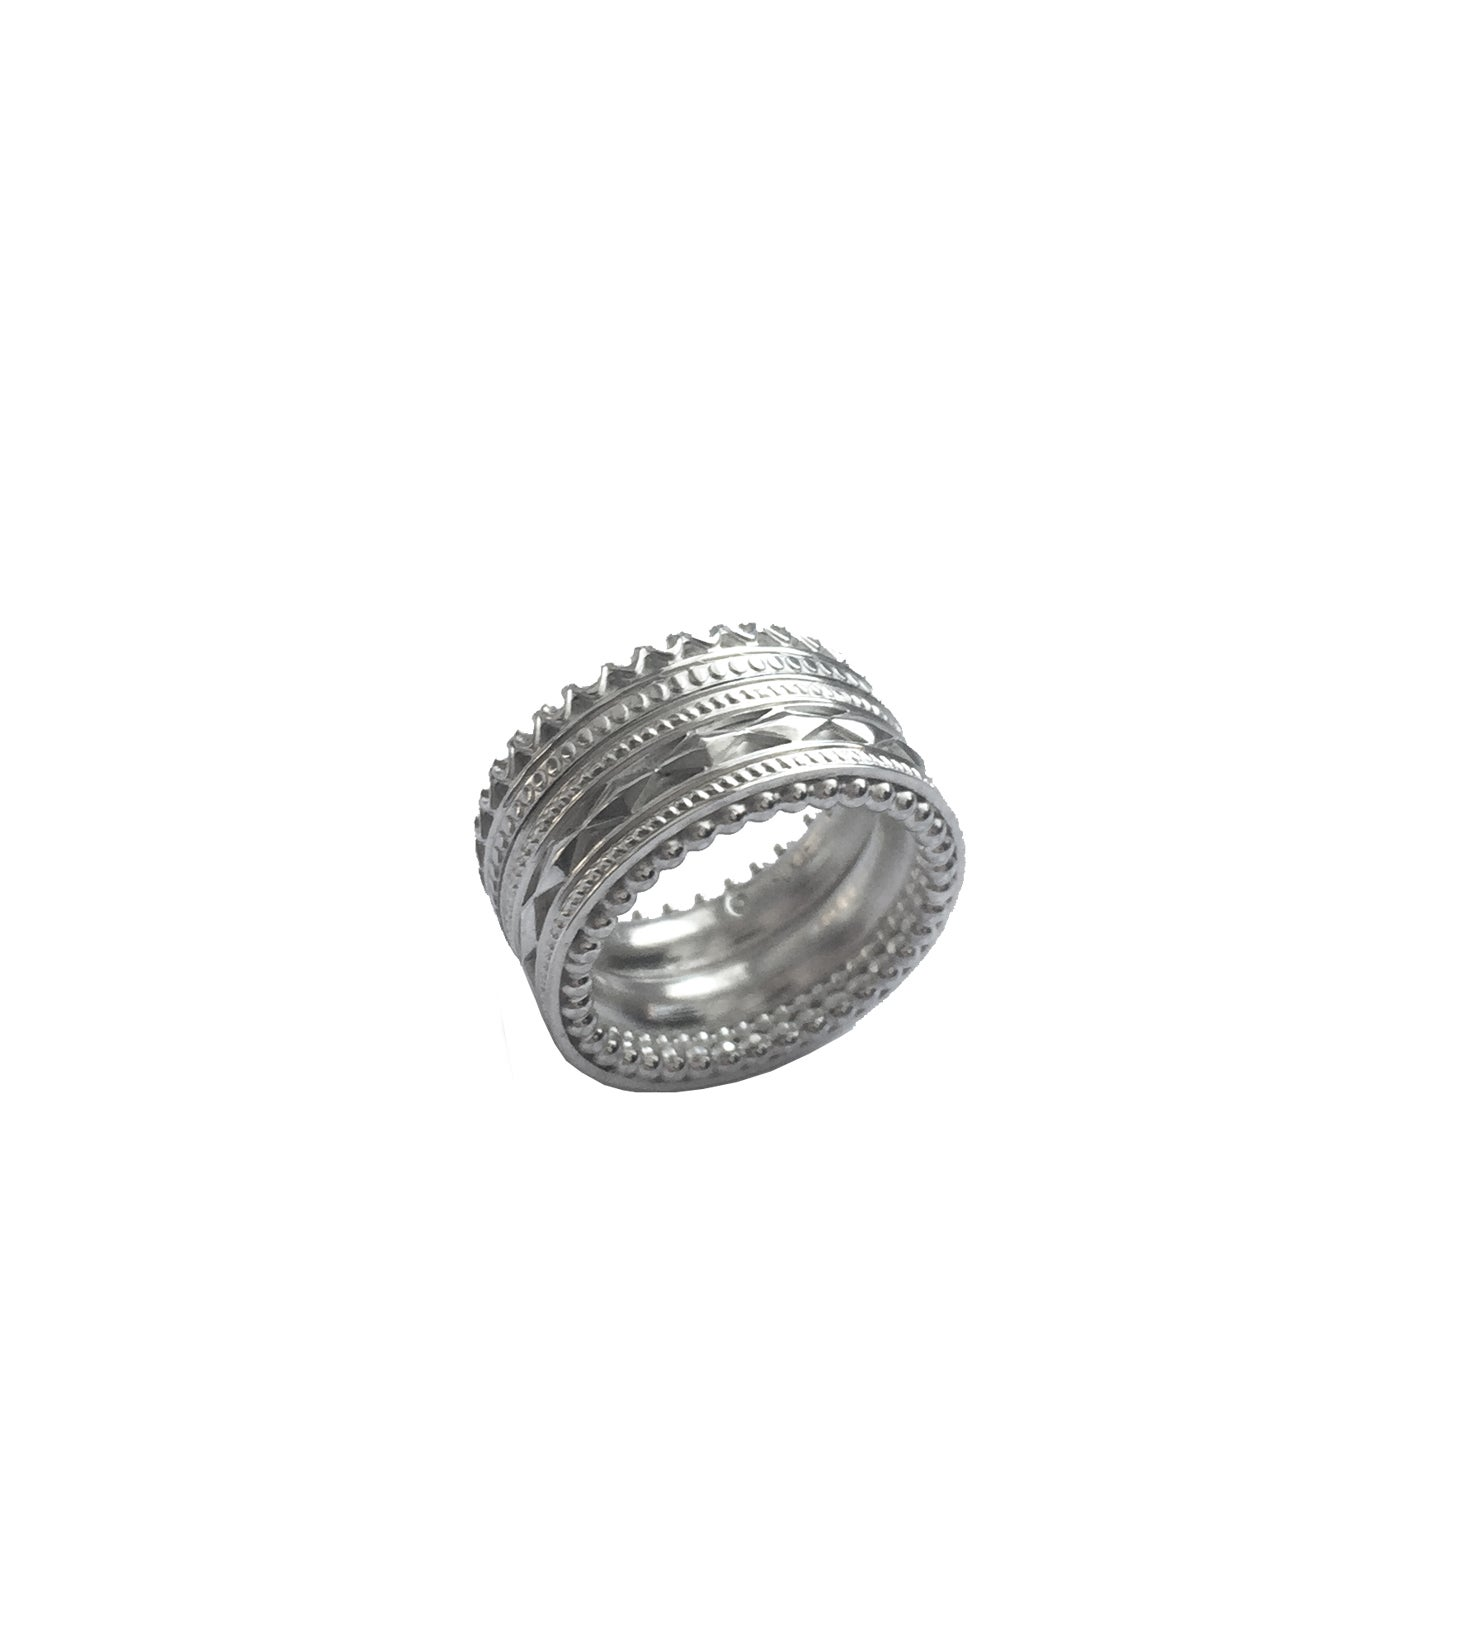 Image of RICHMOND silver